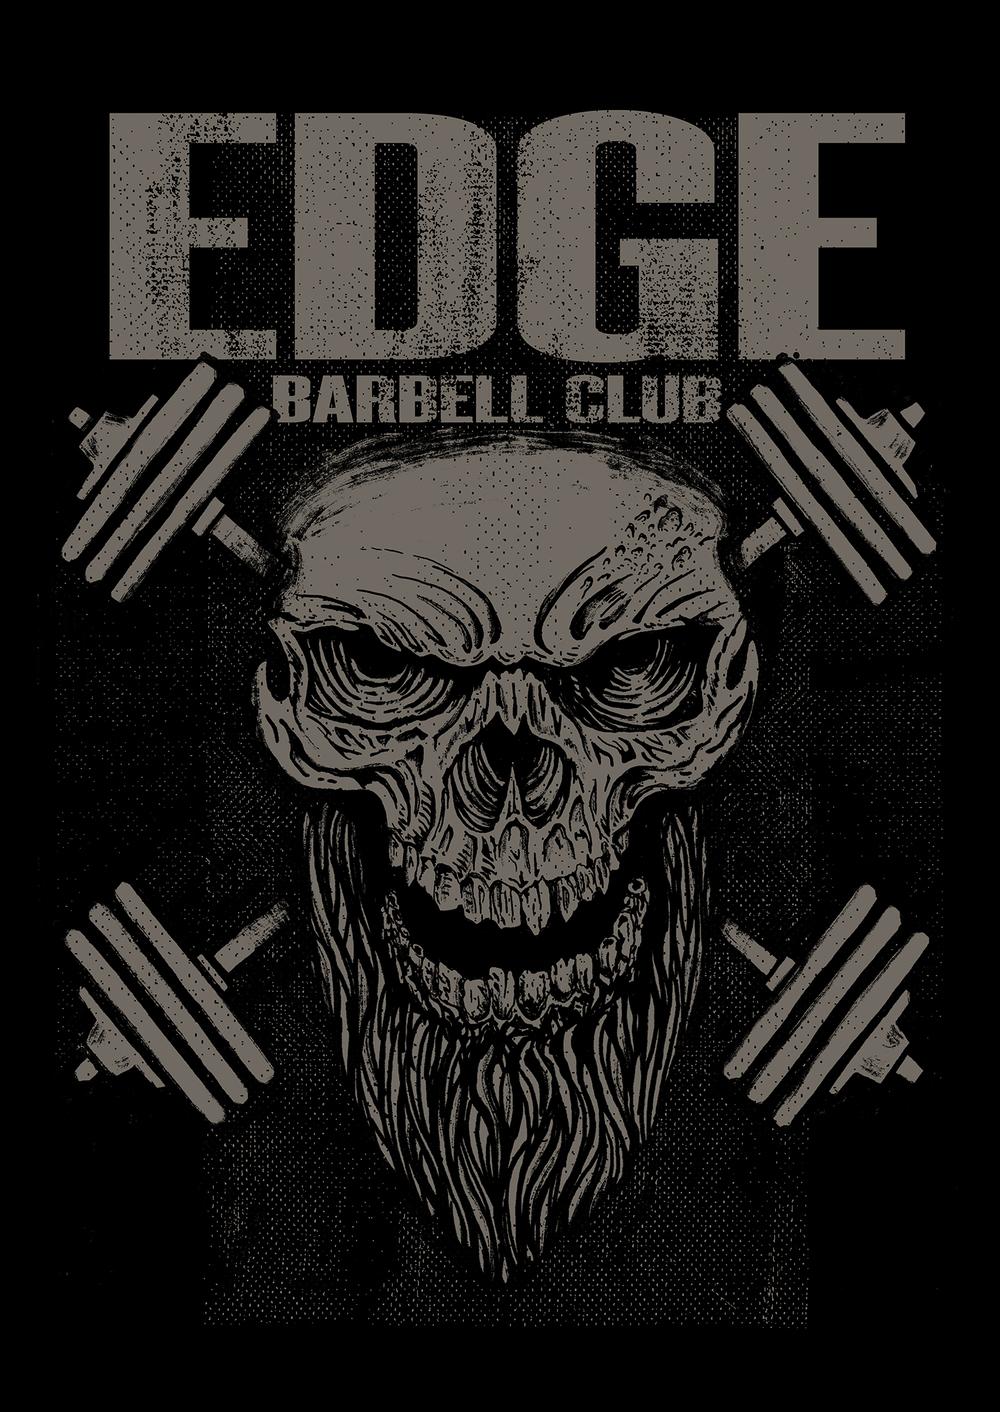 barbellclub.jpg